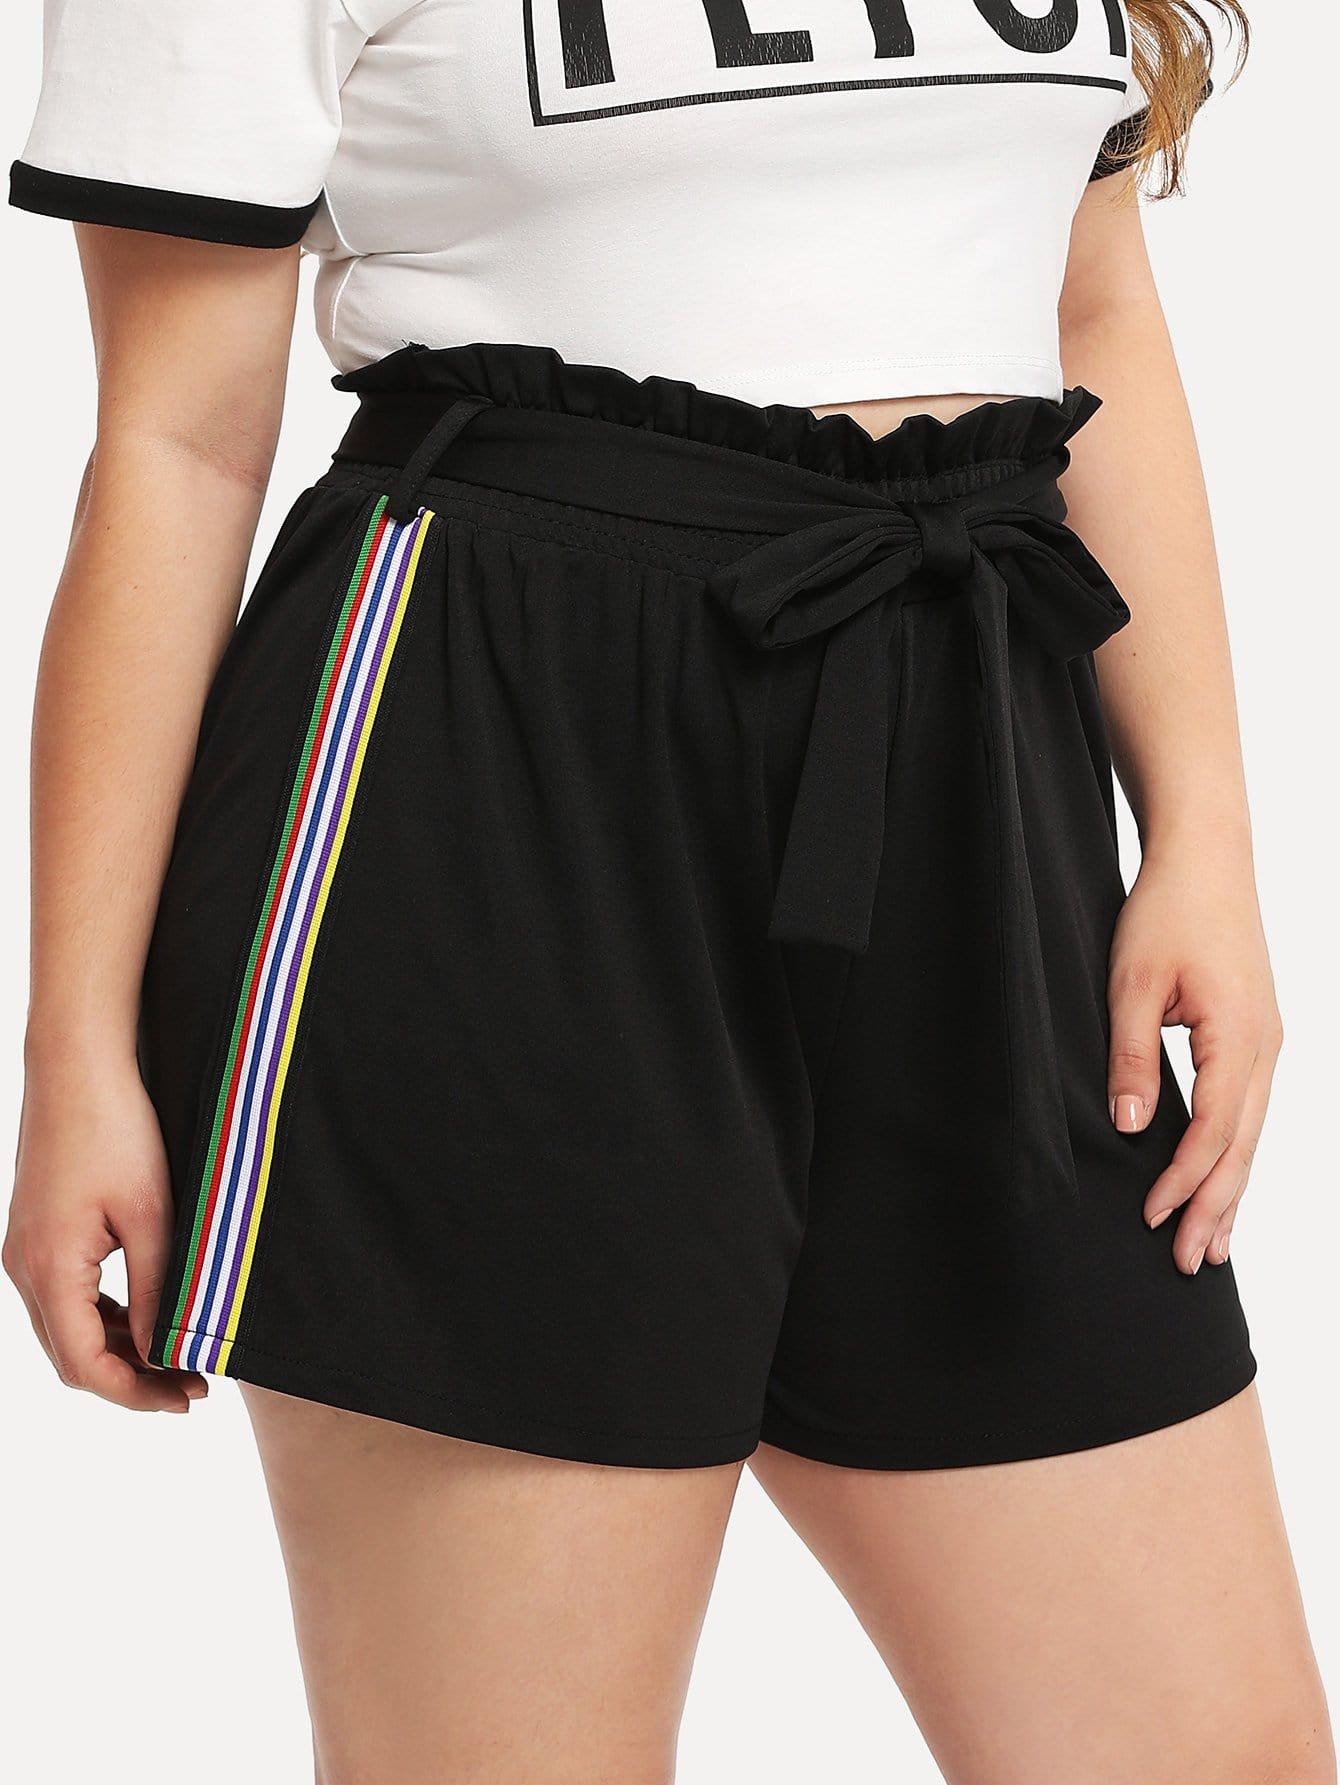 Plus Stripe Tape Side Frill Trim Shorts